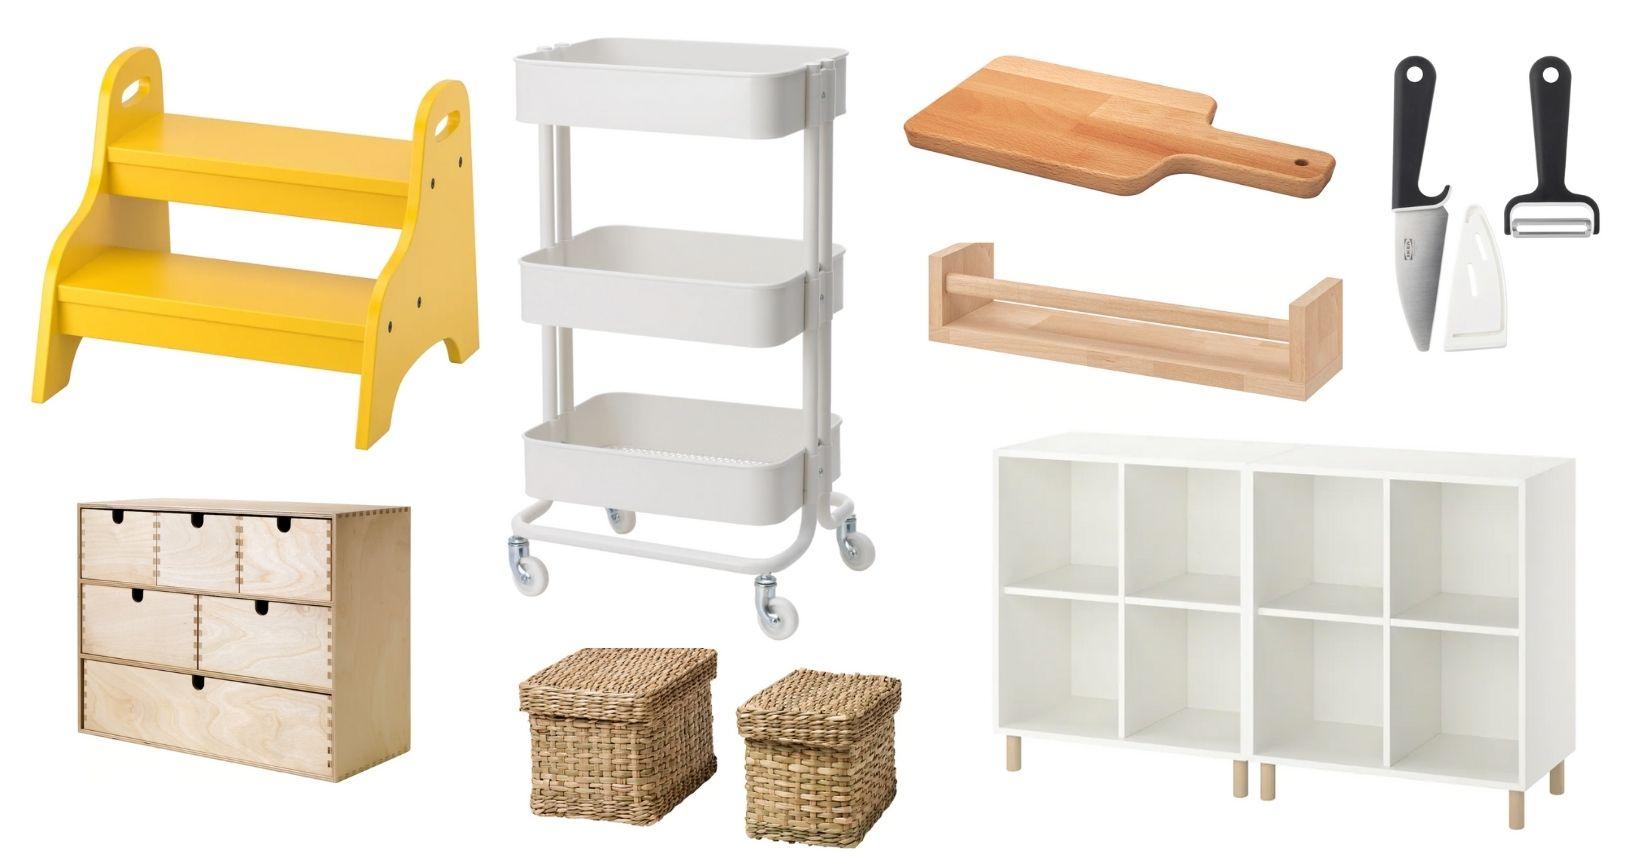 IKEA Montessori Top Picks for a Practical & Child-friendly Home